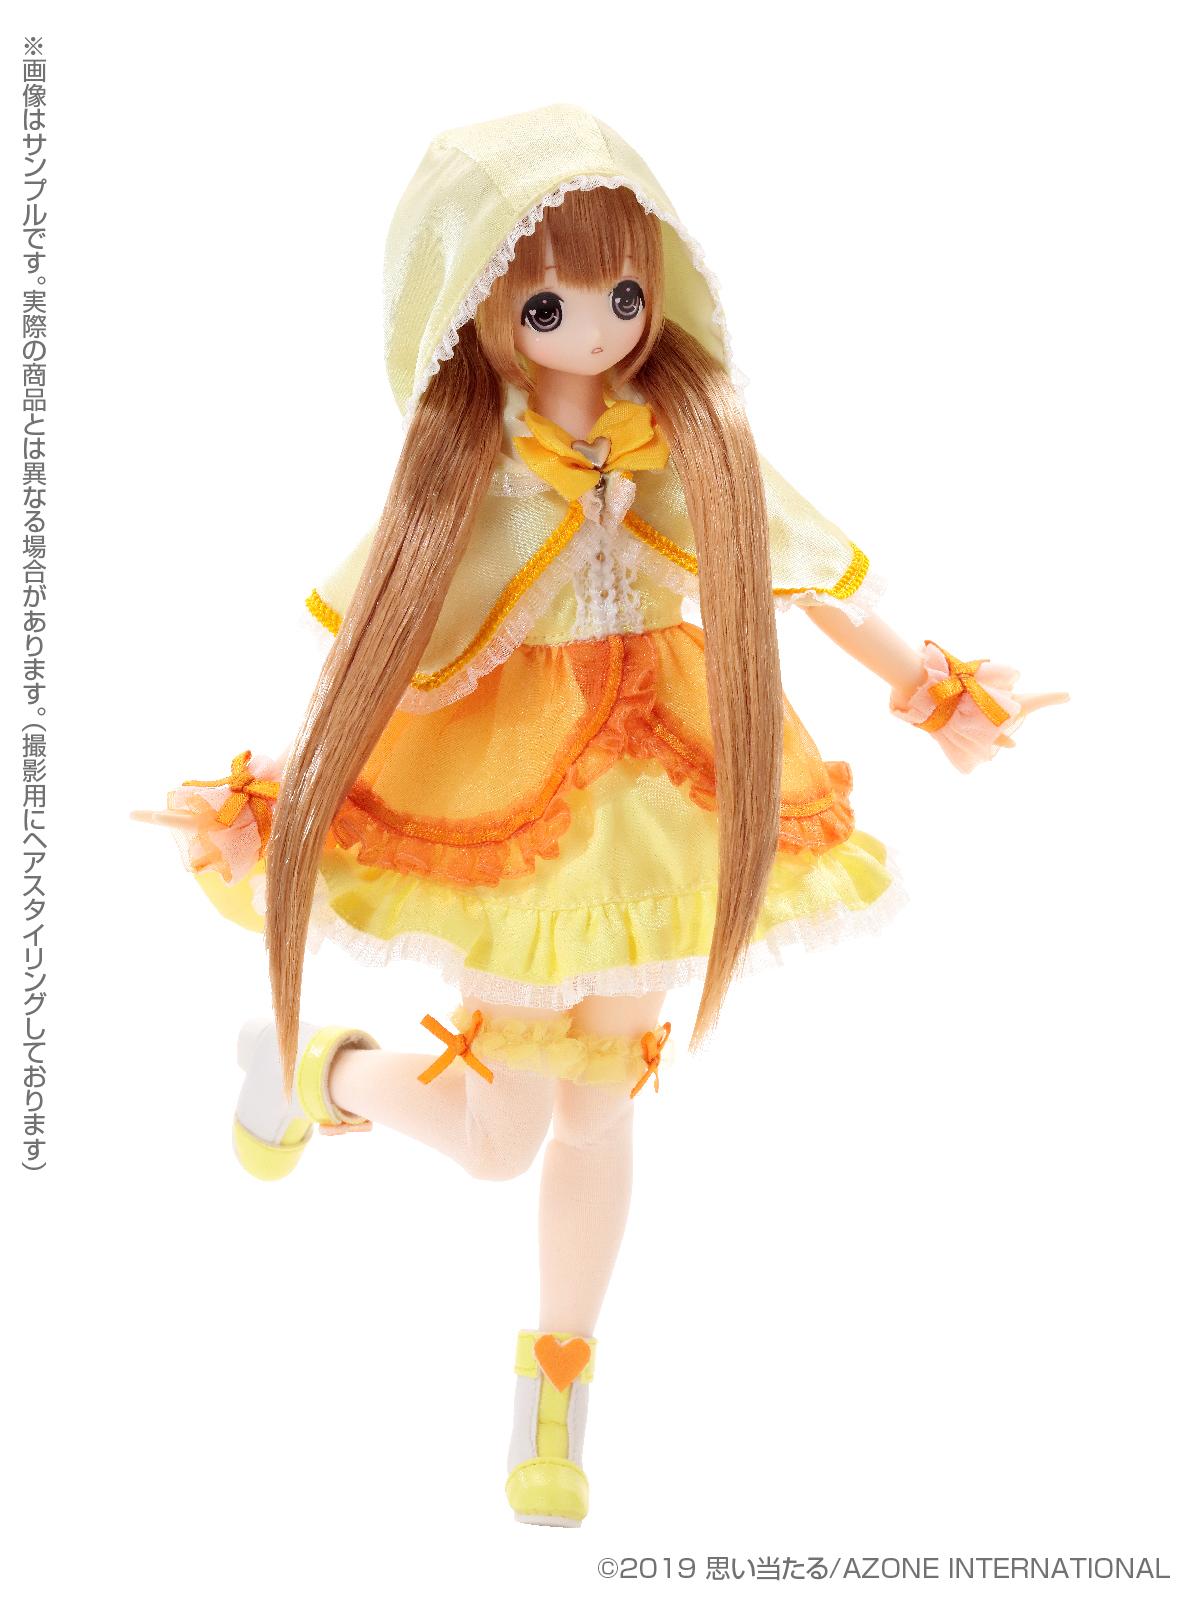 Magical☆CUTE『Pure Heart Chiika(ピュアハート ちいか)』えっくす☆きゅーと 1/6 完成品ドール-003